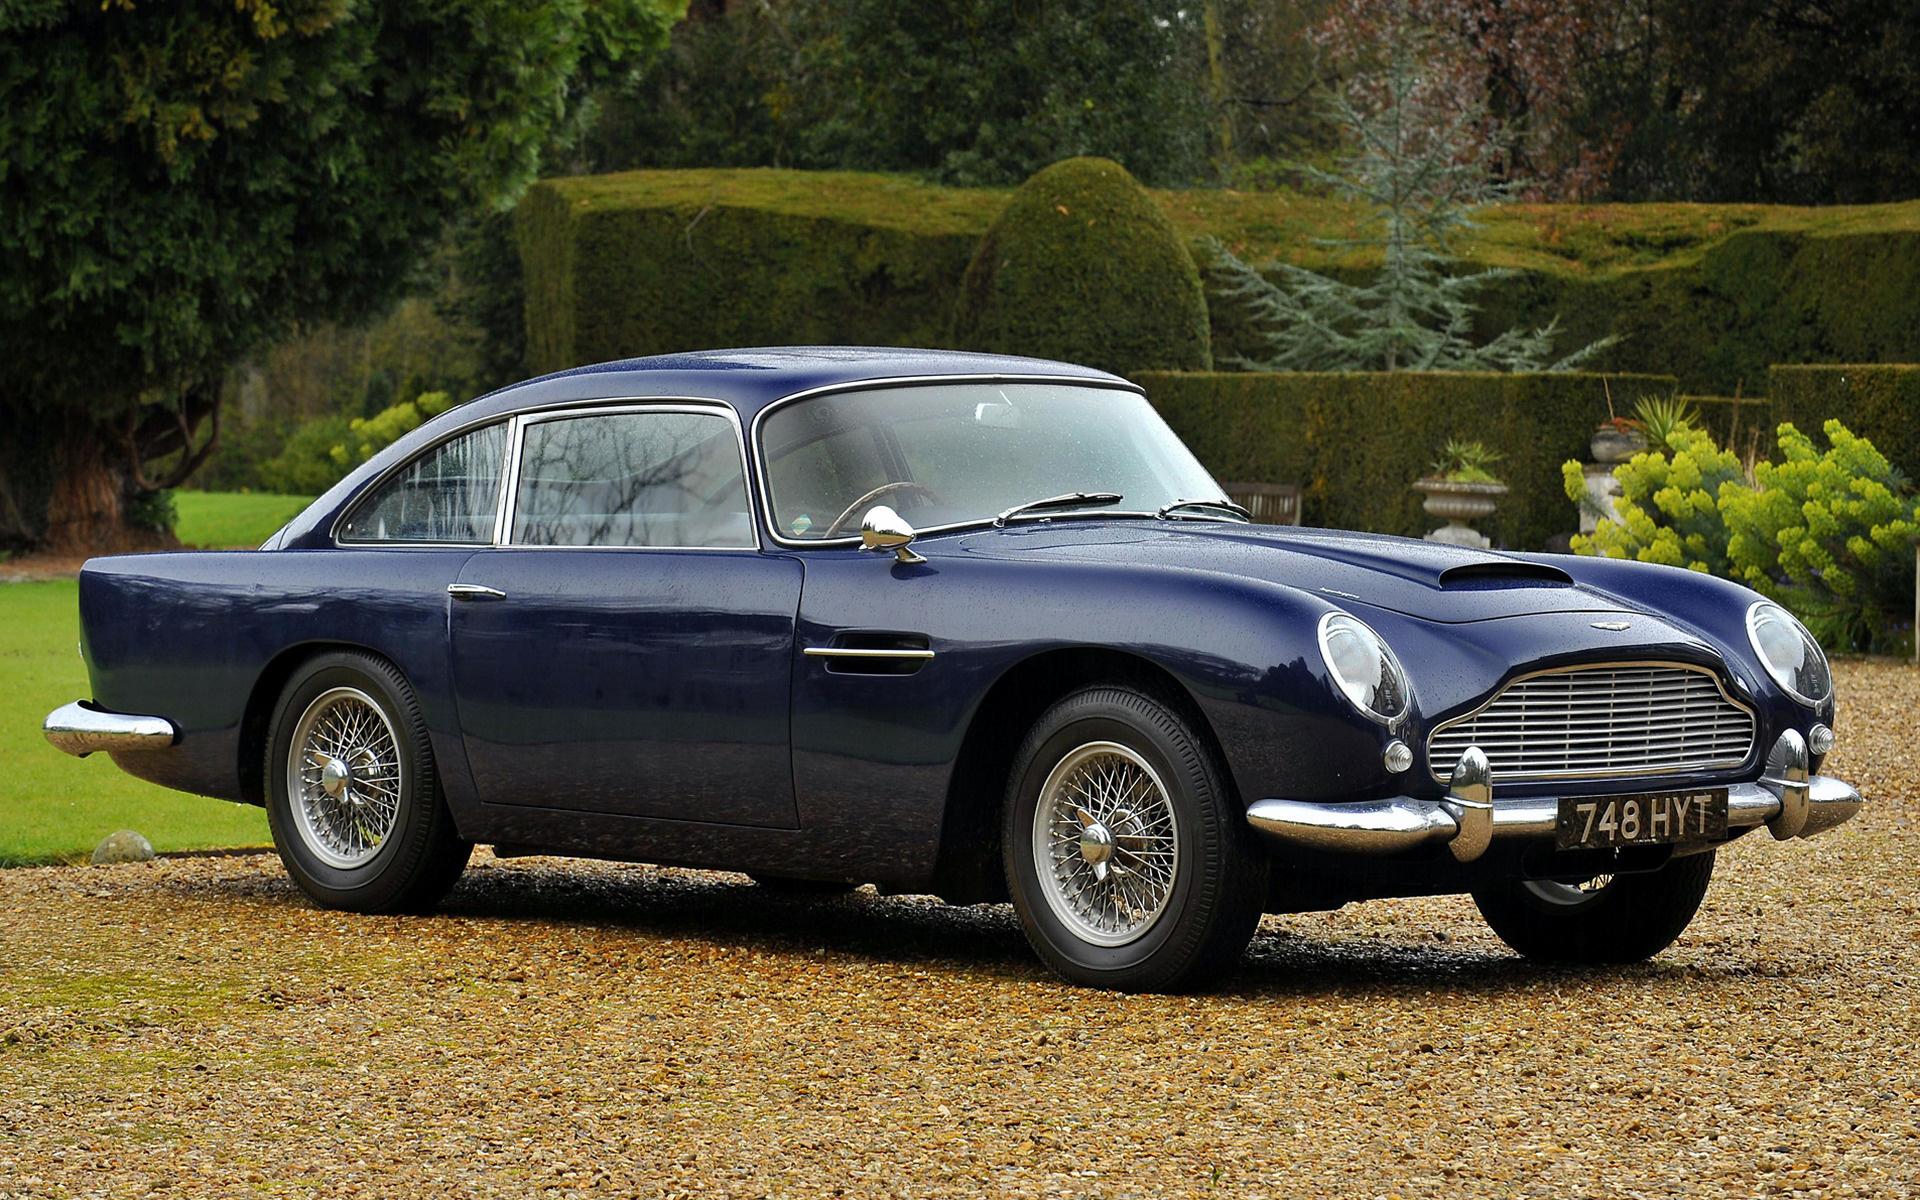 1962 Aston Martin Db4 Vantage V Uk Wallpapers And Hd Images Car Pixel